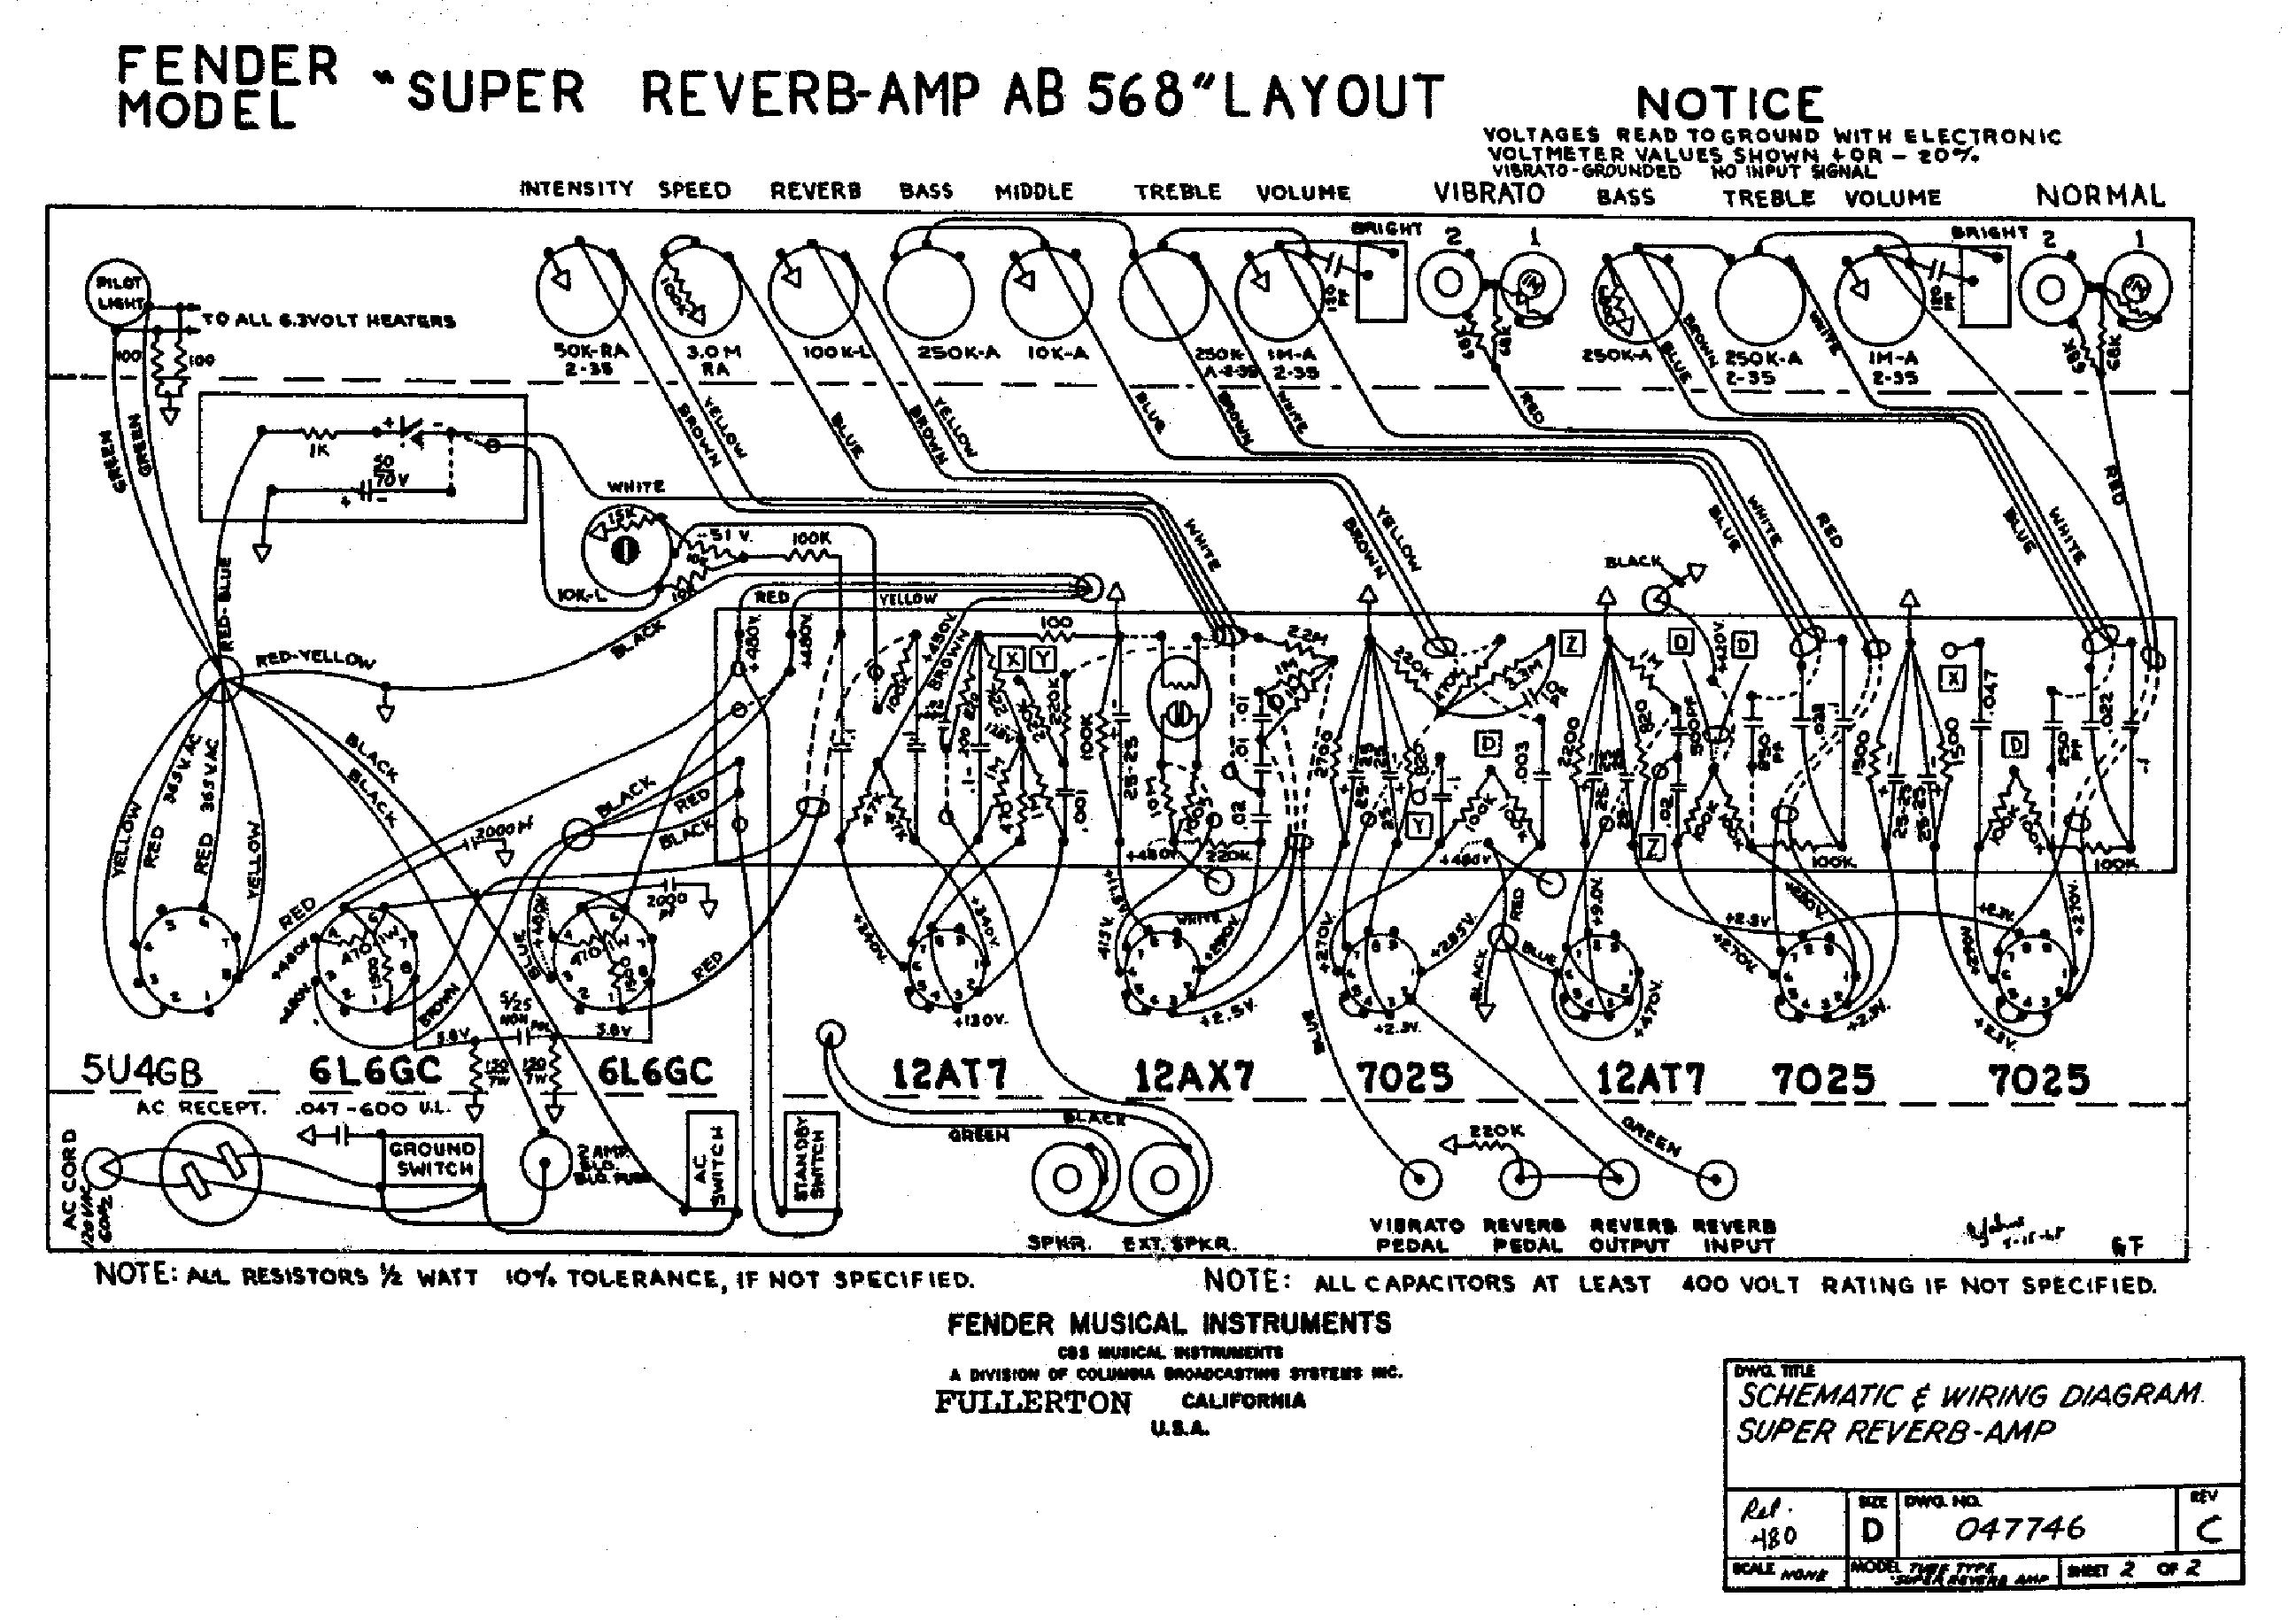 Fender Super Reverb Ab568 Sch Service Manual Download